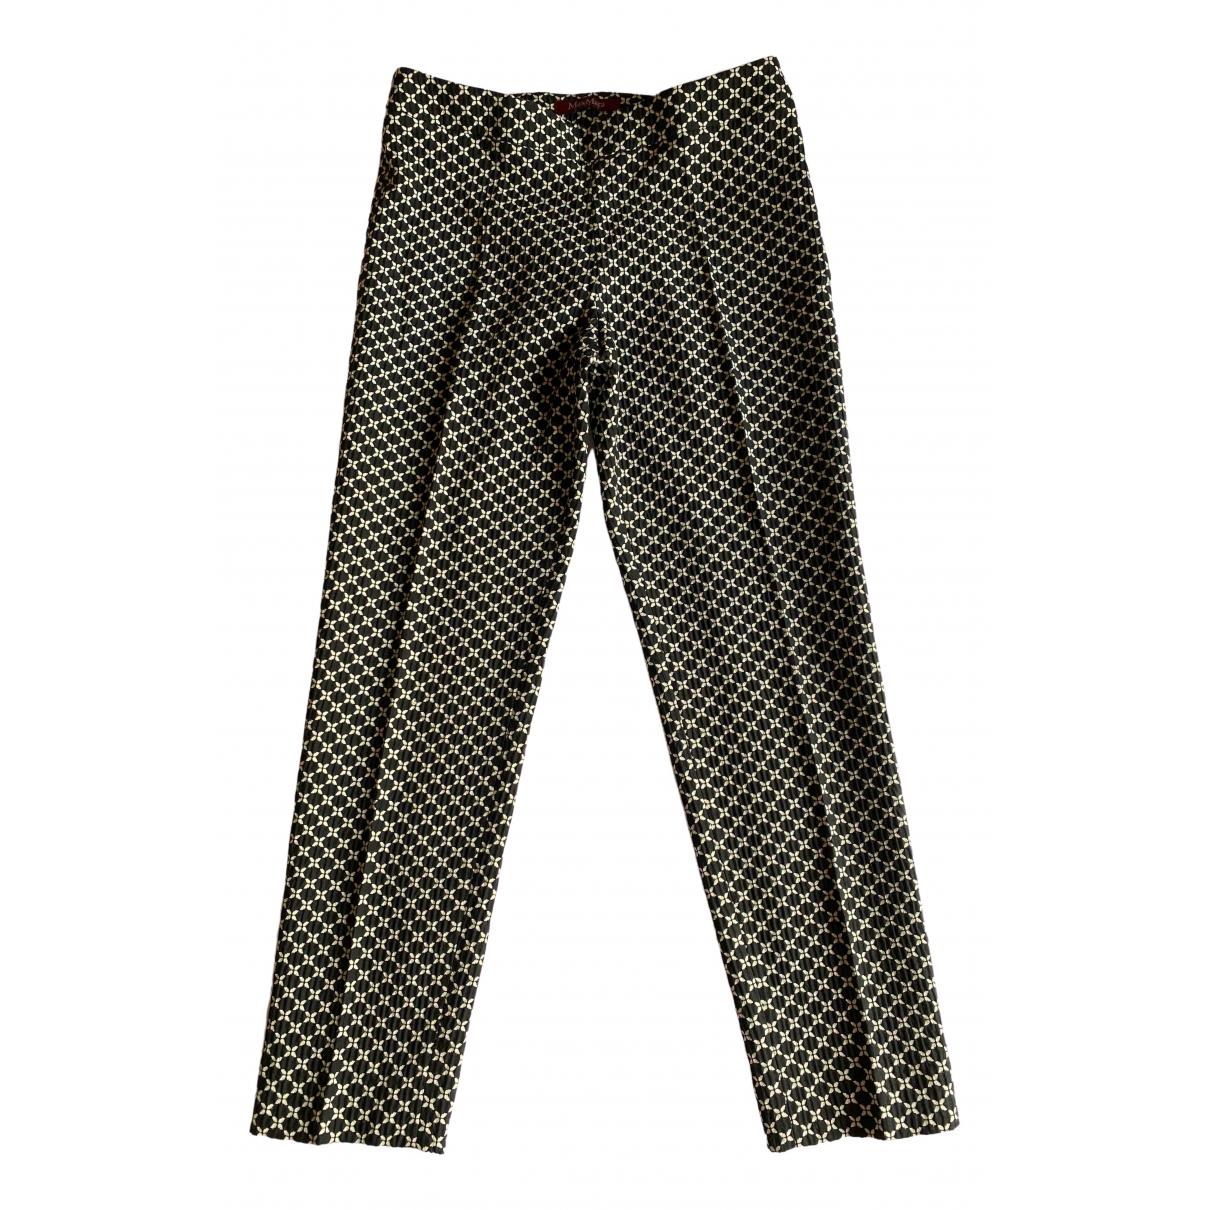 Max Mara Studio \N Black Trousers for Women 42 IT